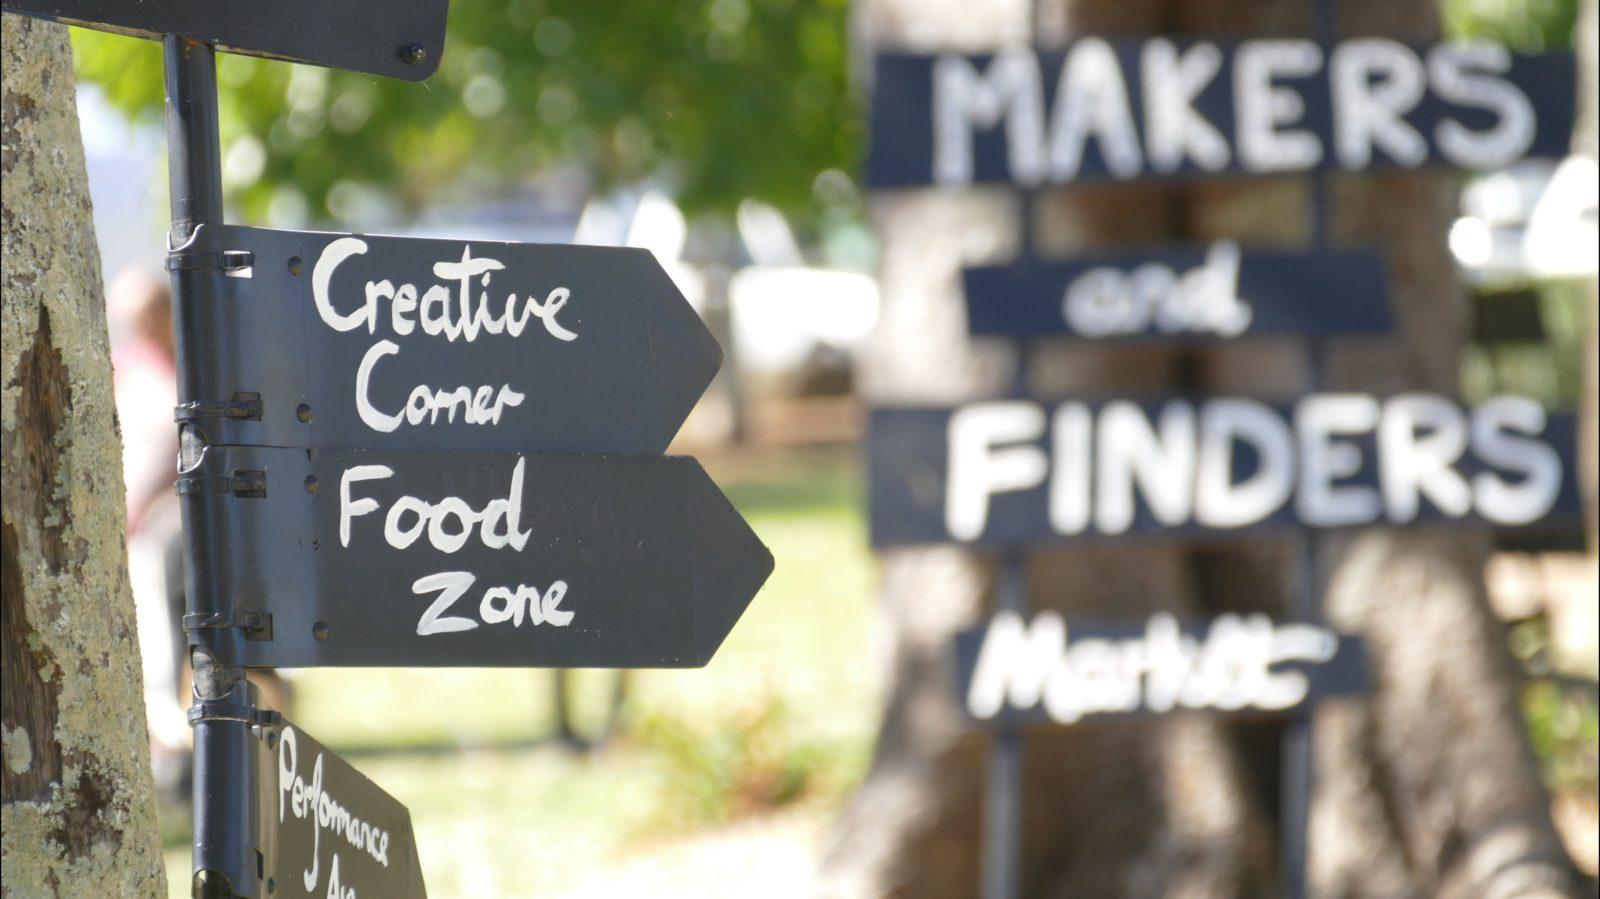 Makers and Finders Market Murwillumbah